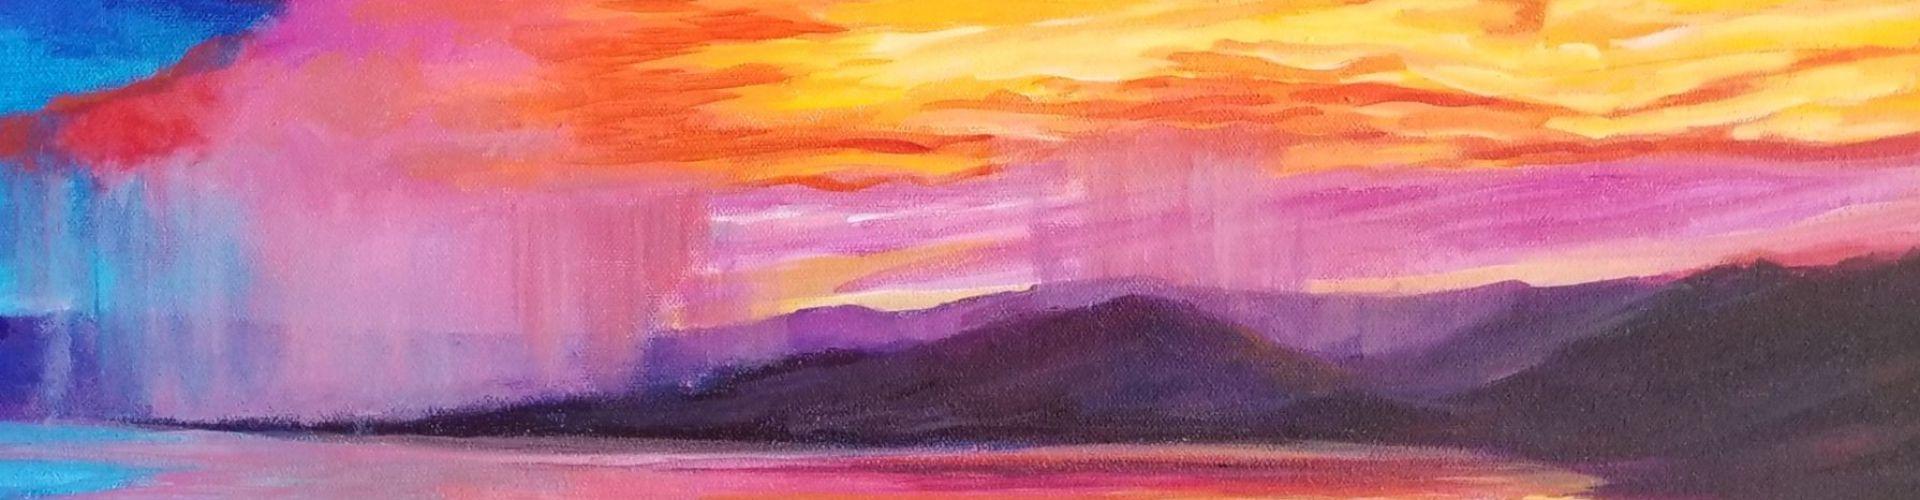 The Night Show painting by Linda Lovisa